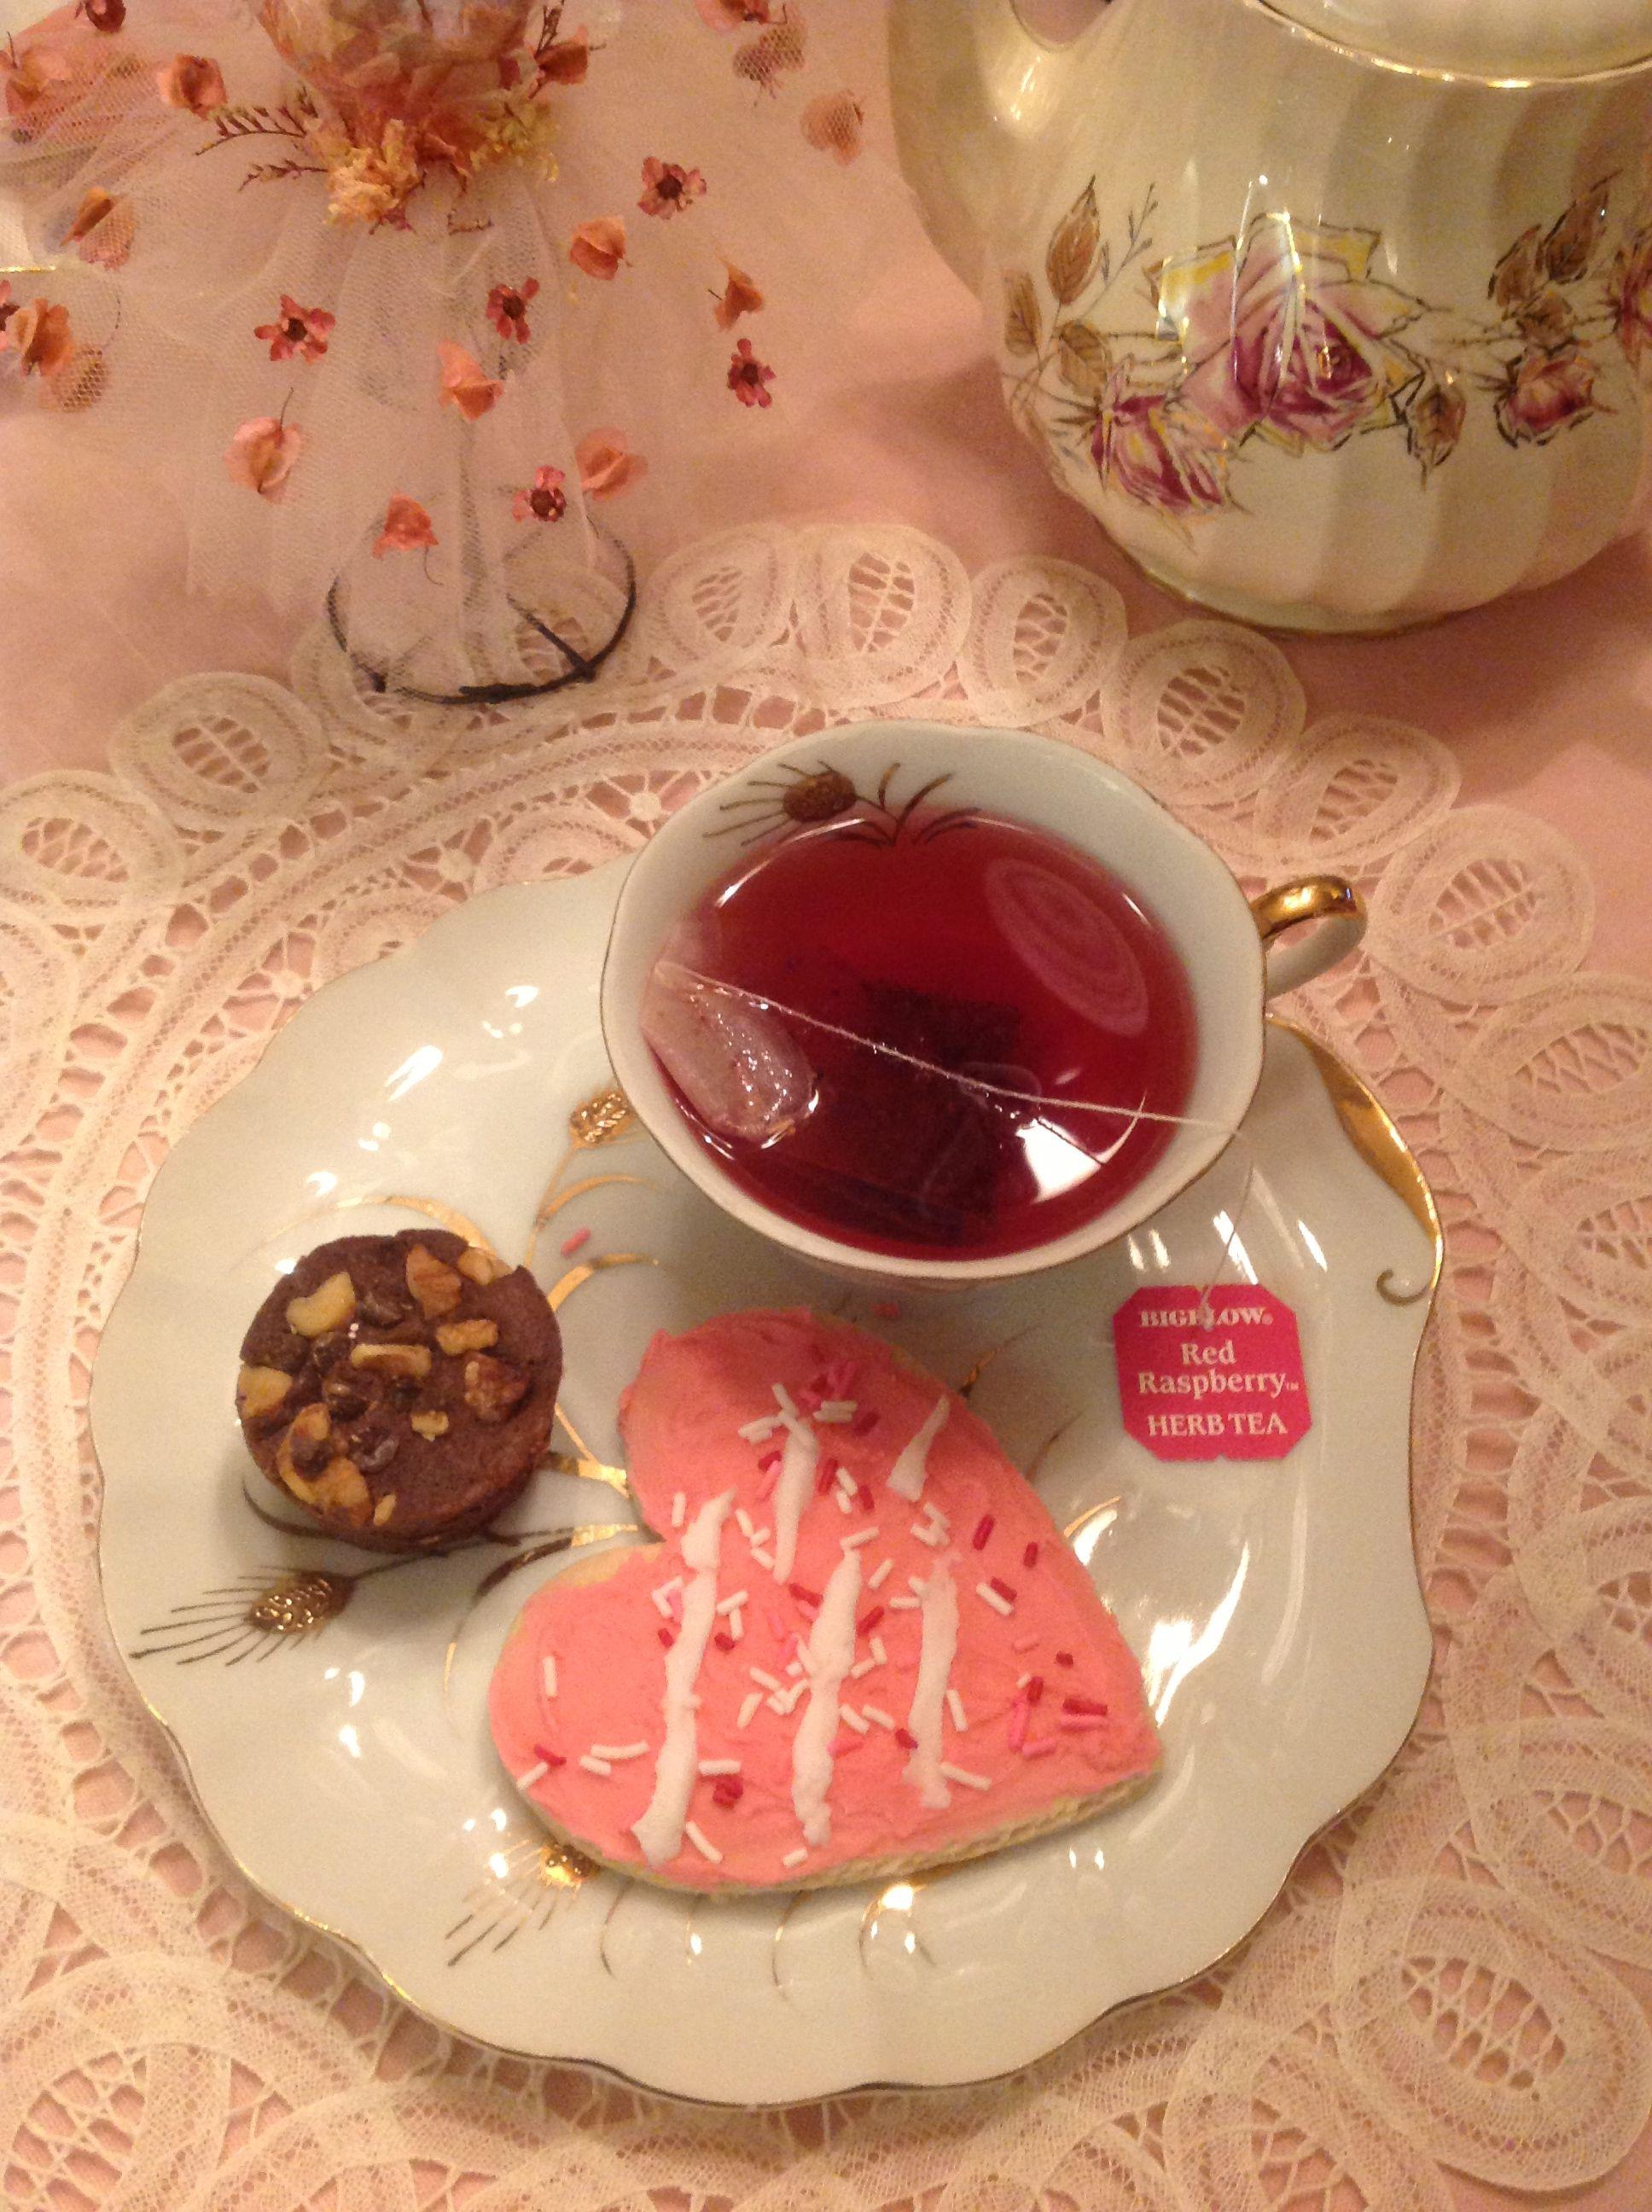 Our Victorian tea party with Bigelow Raspberry Tea!  #AmericasTea #CBias